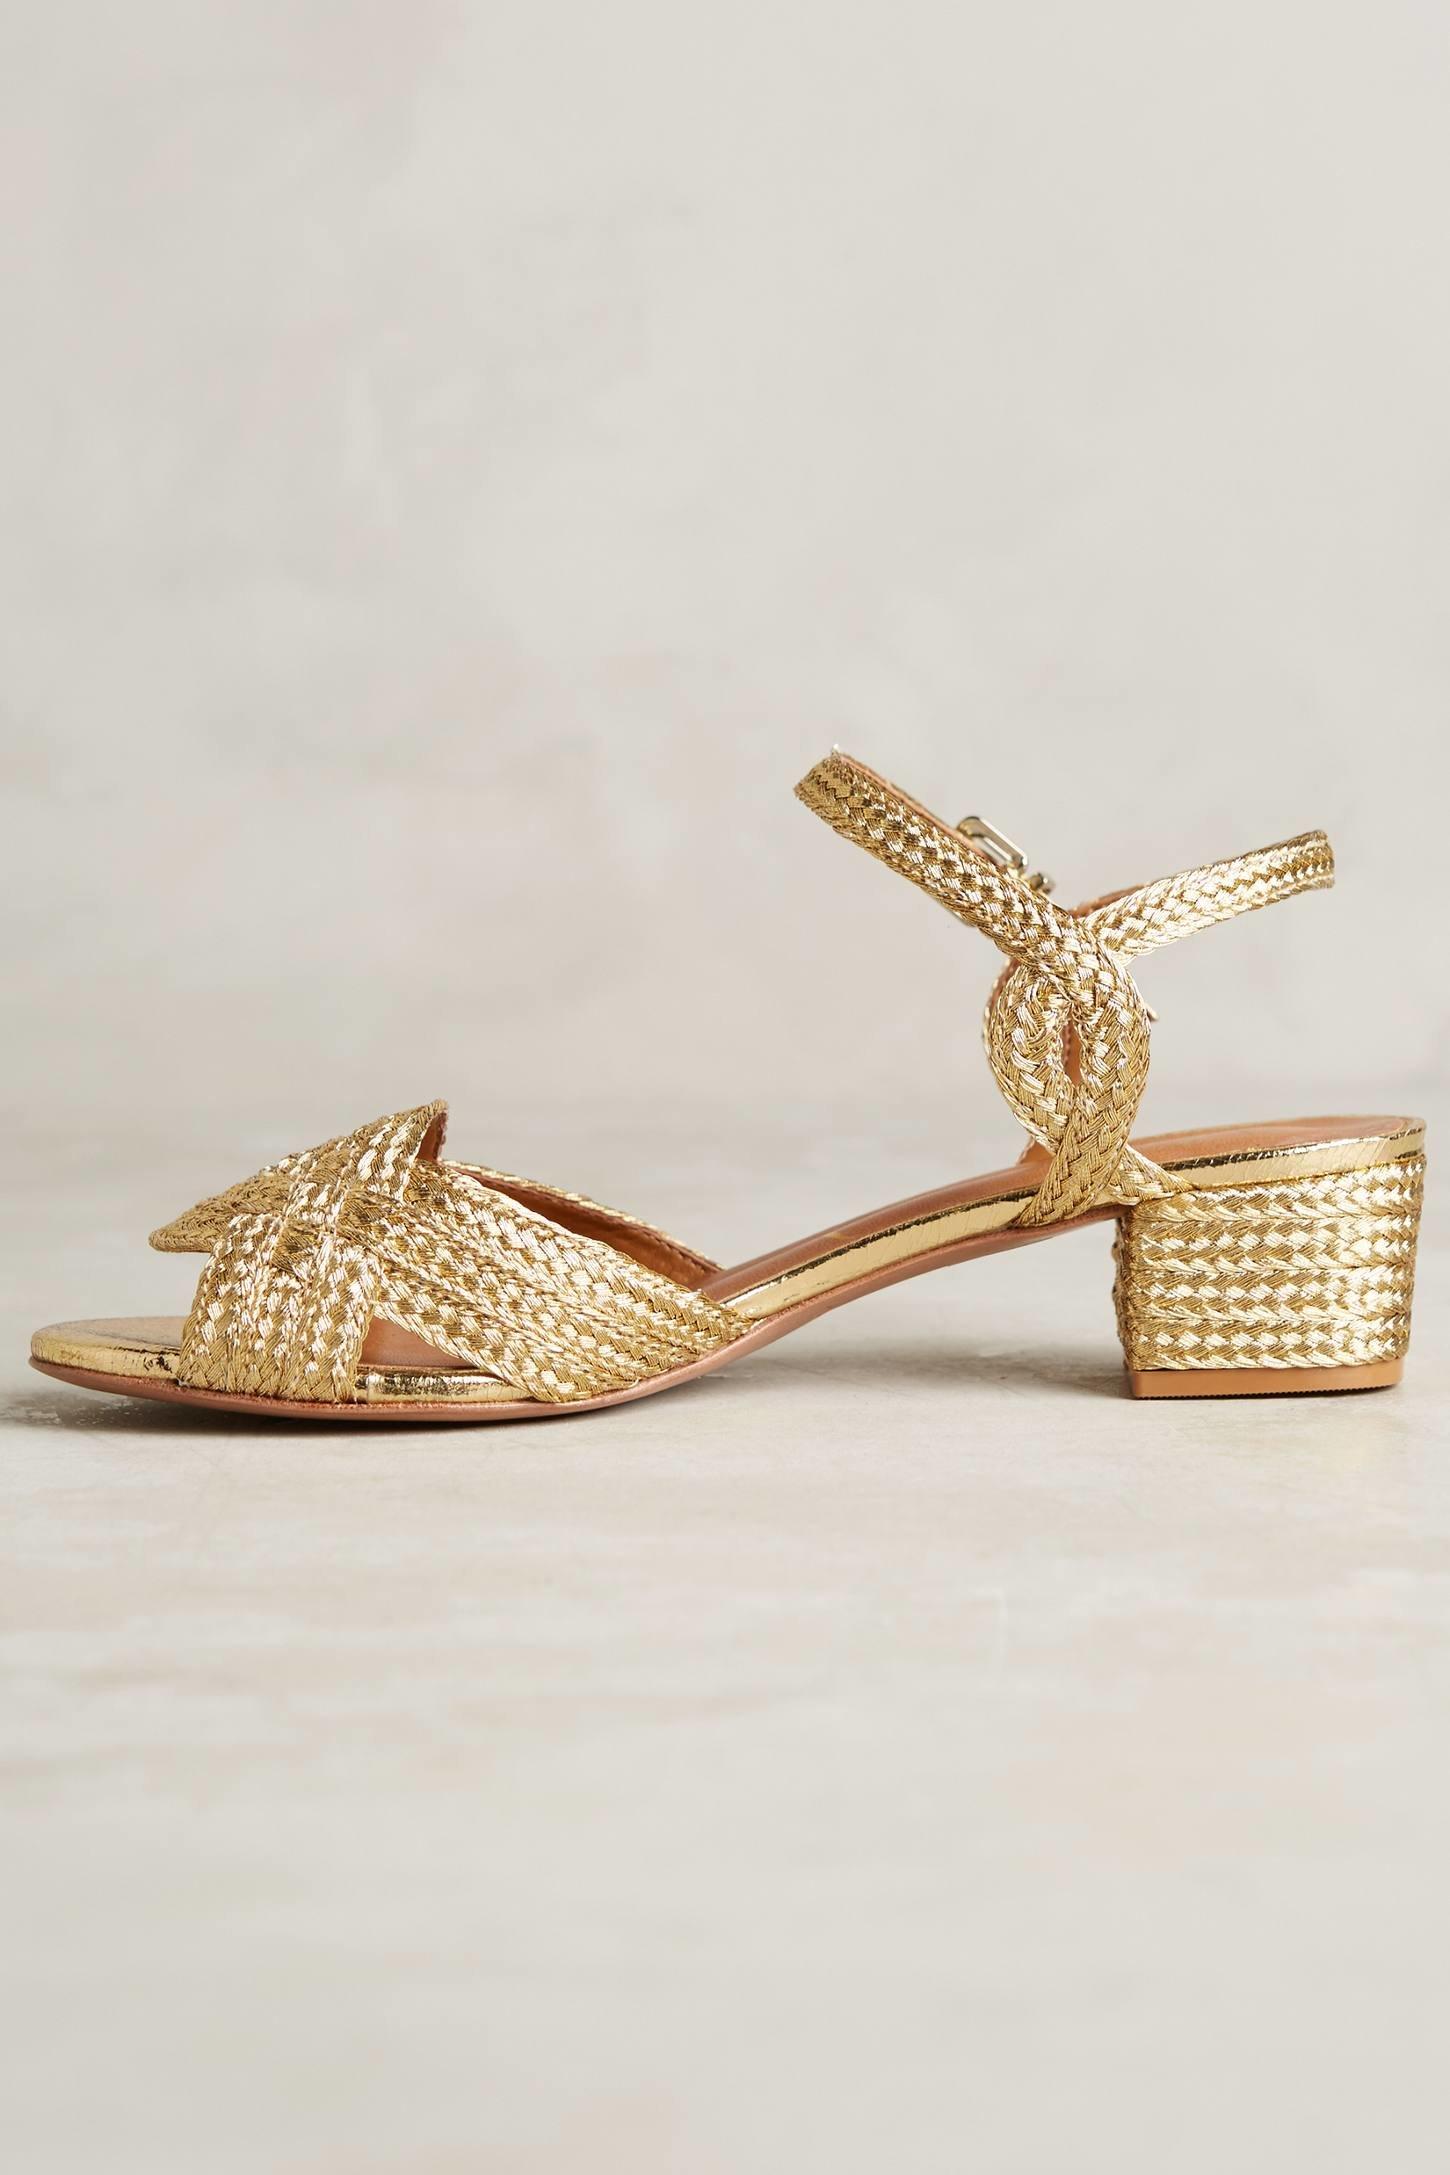 Vicenza Shoes Uk